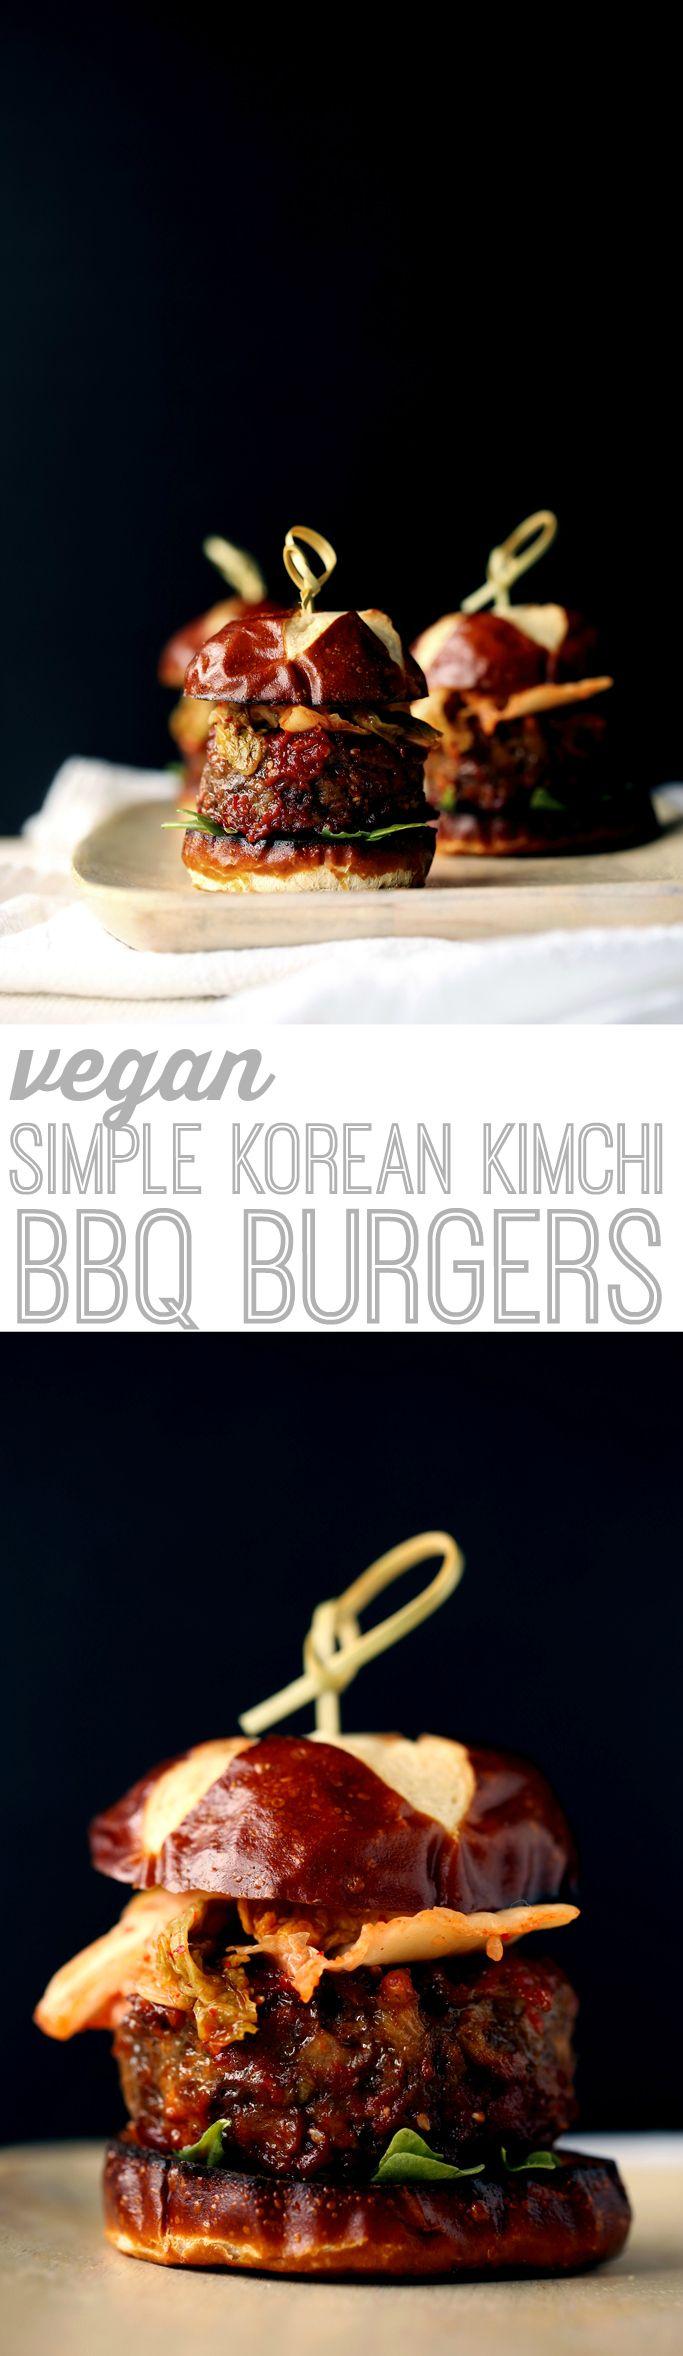 Vegan Simple Korean Kimchi BBQ Burgers from Mastering the Art of Vegan Cooking